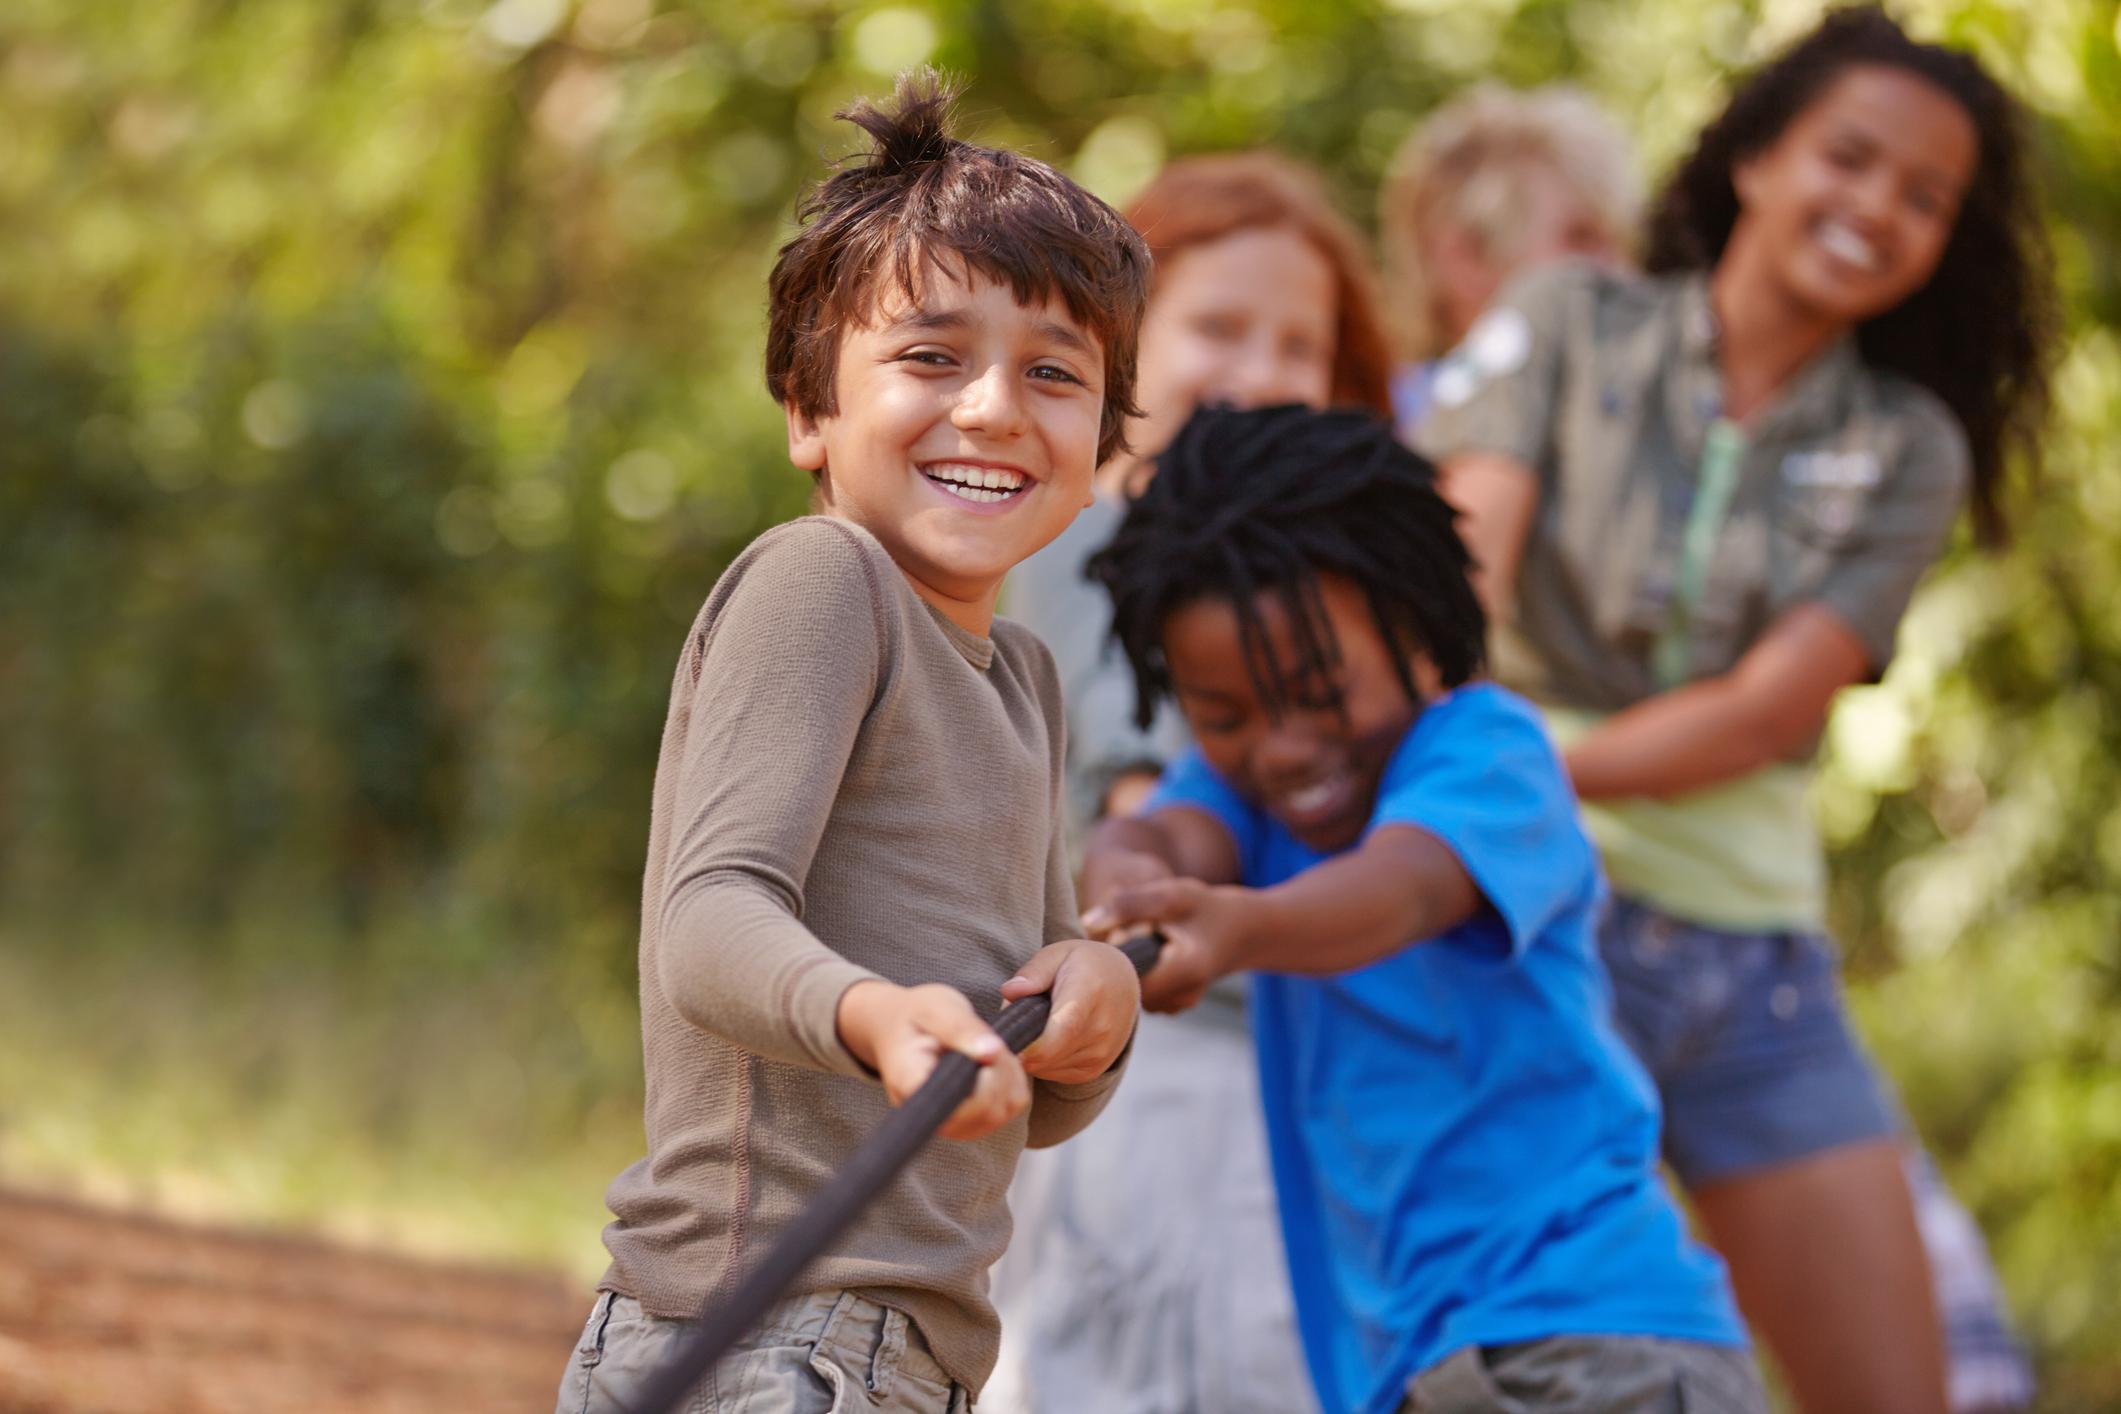 Children playing tug-a-war